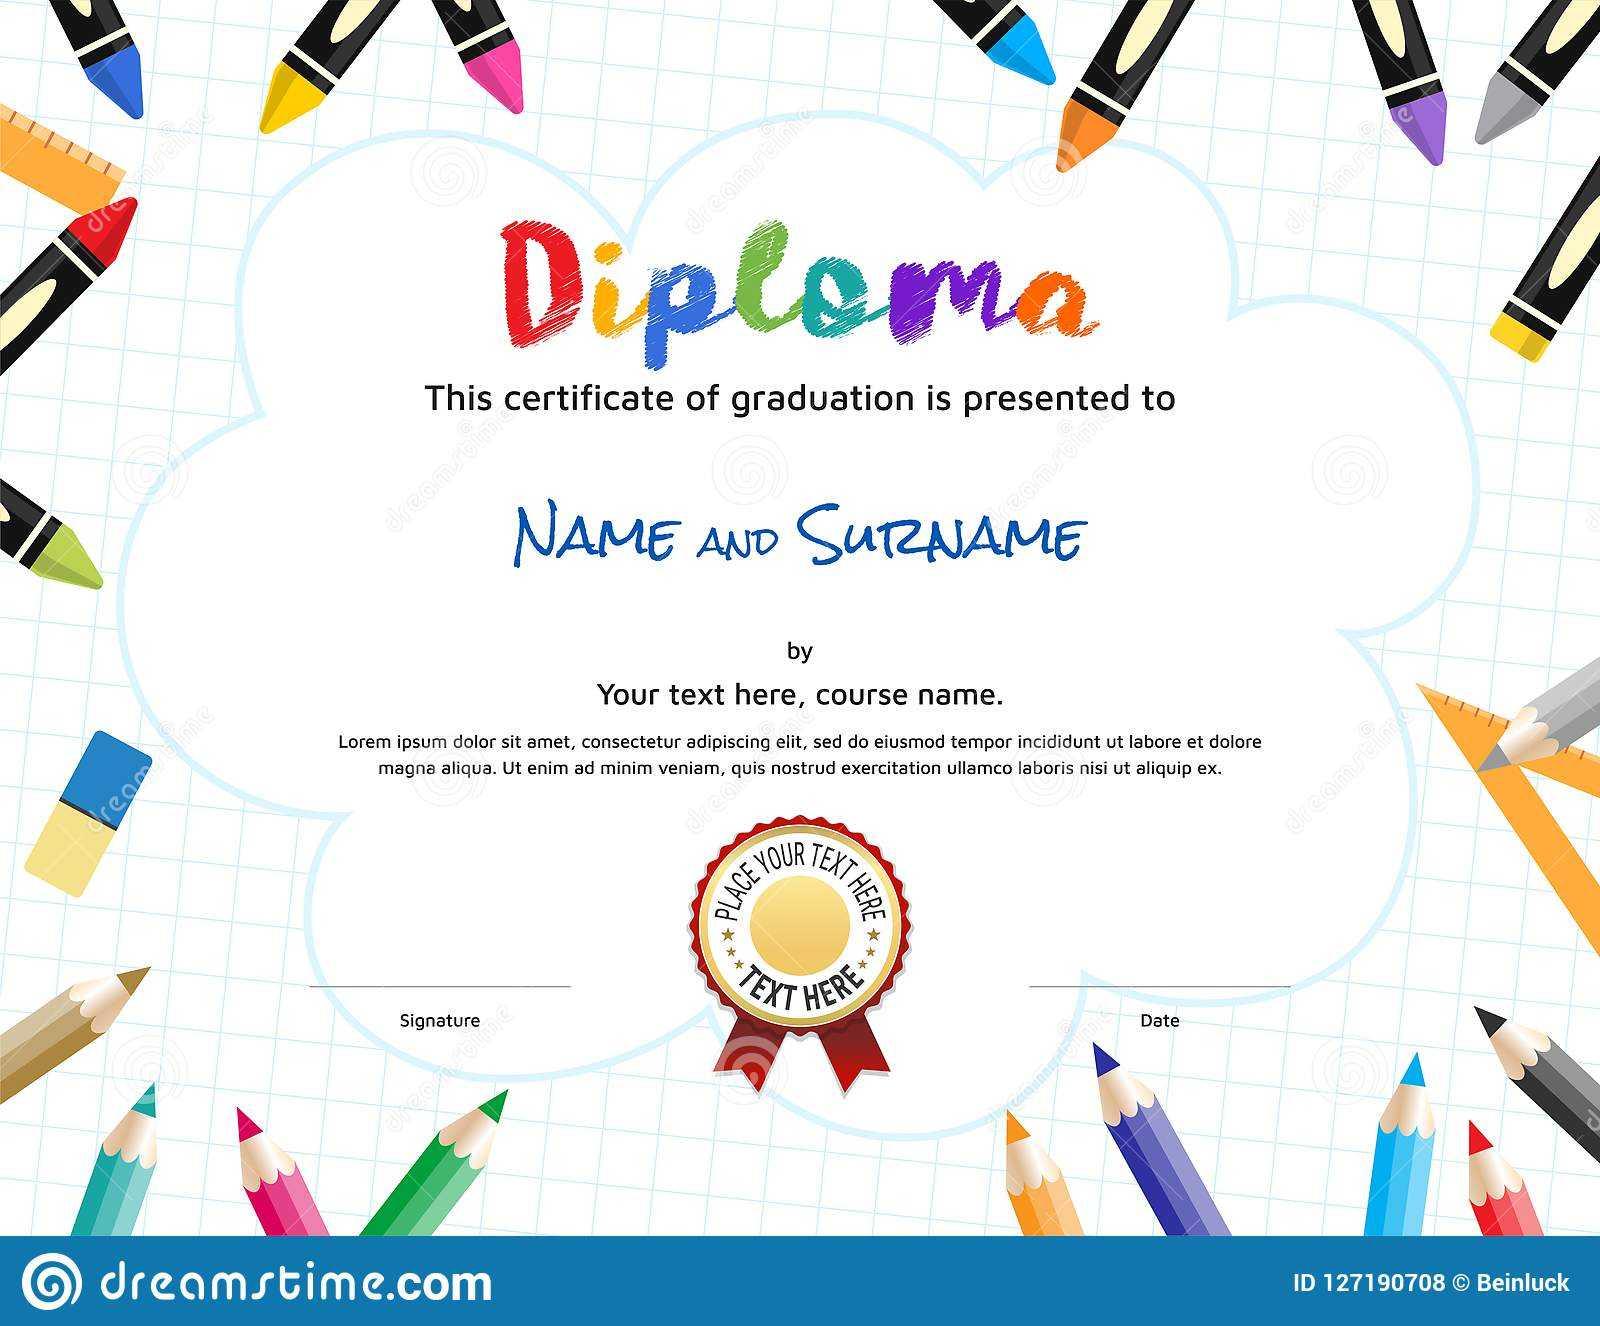 Kids Diploma Or Certificate Template With Painting Stuff Regarding Preschool Graduation Certificate Template Free